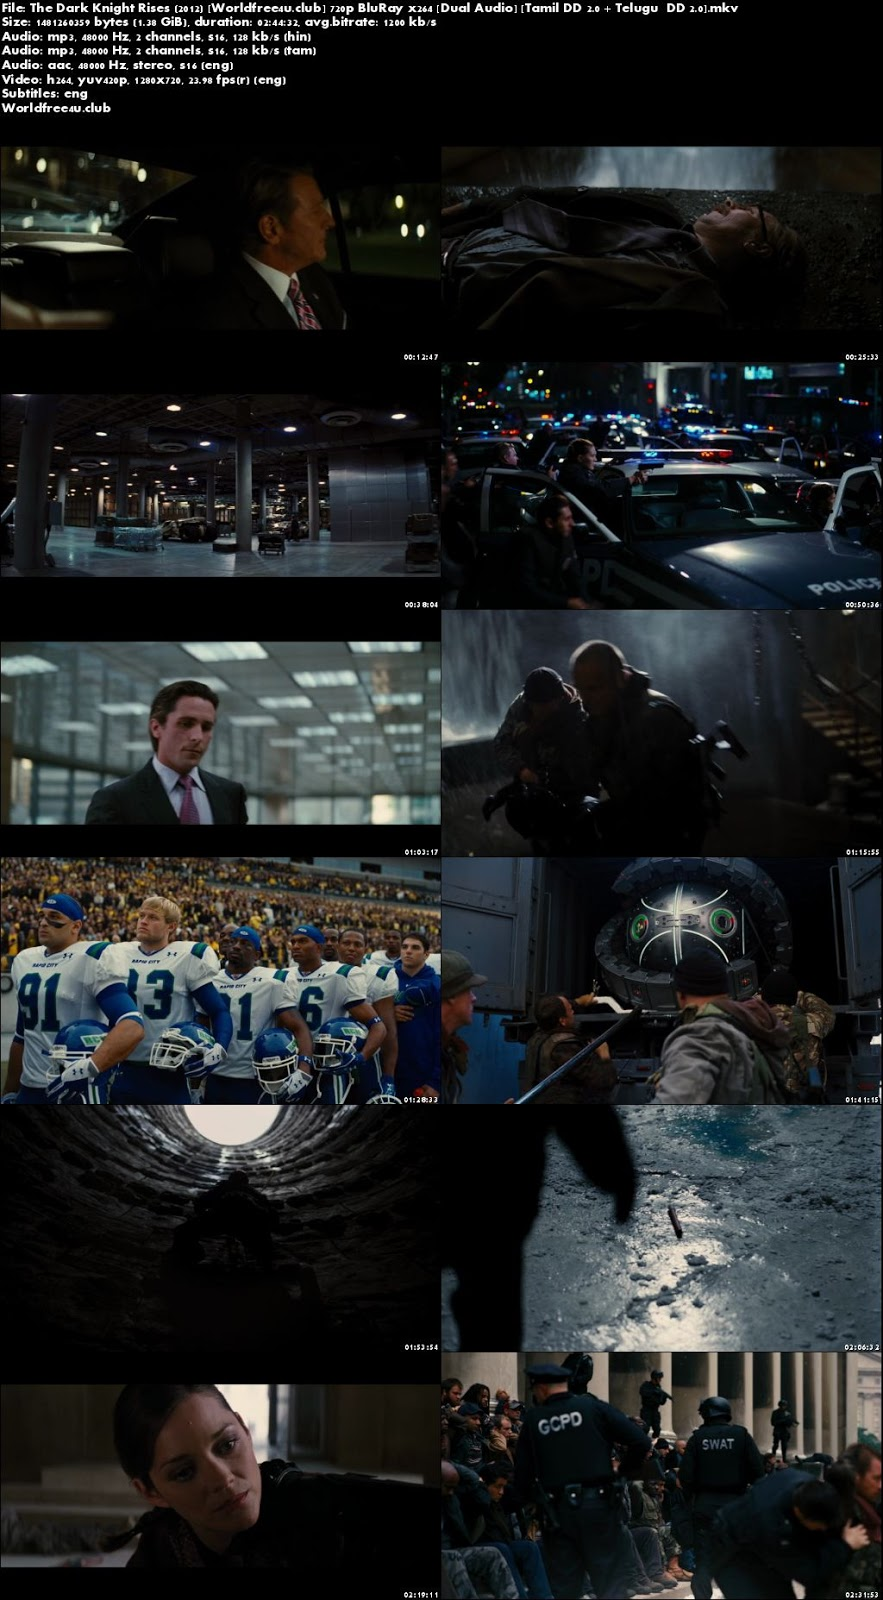 The Dark Knight Rises 2012 world4free.ind.in Dual Audio BRRip 720p Tamil Telugu